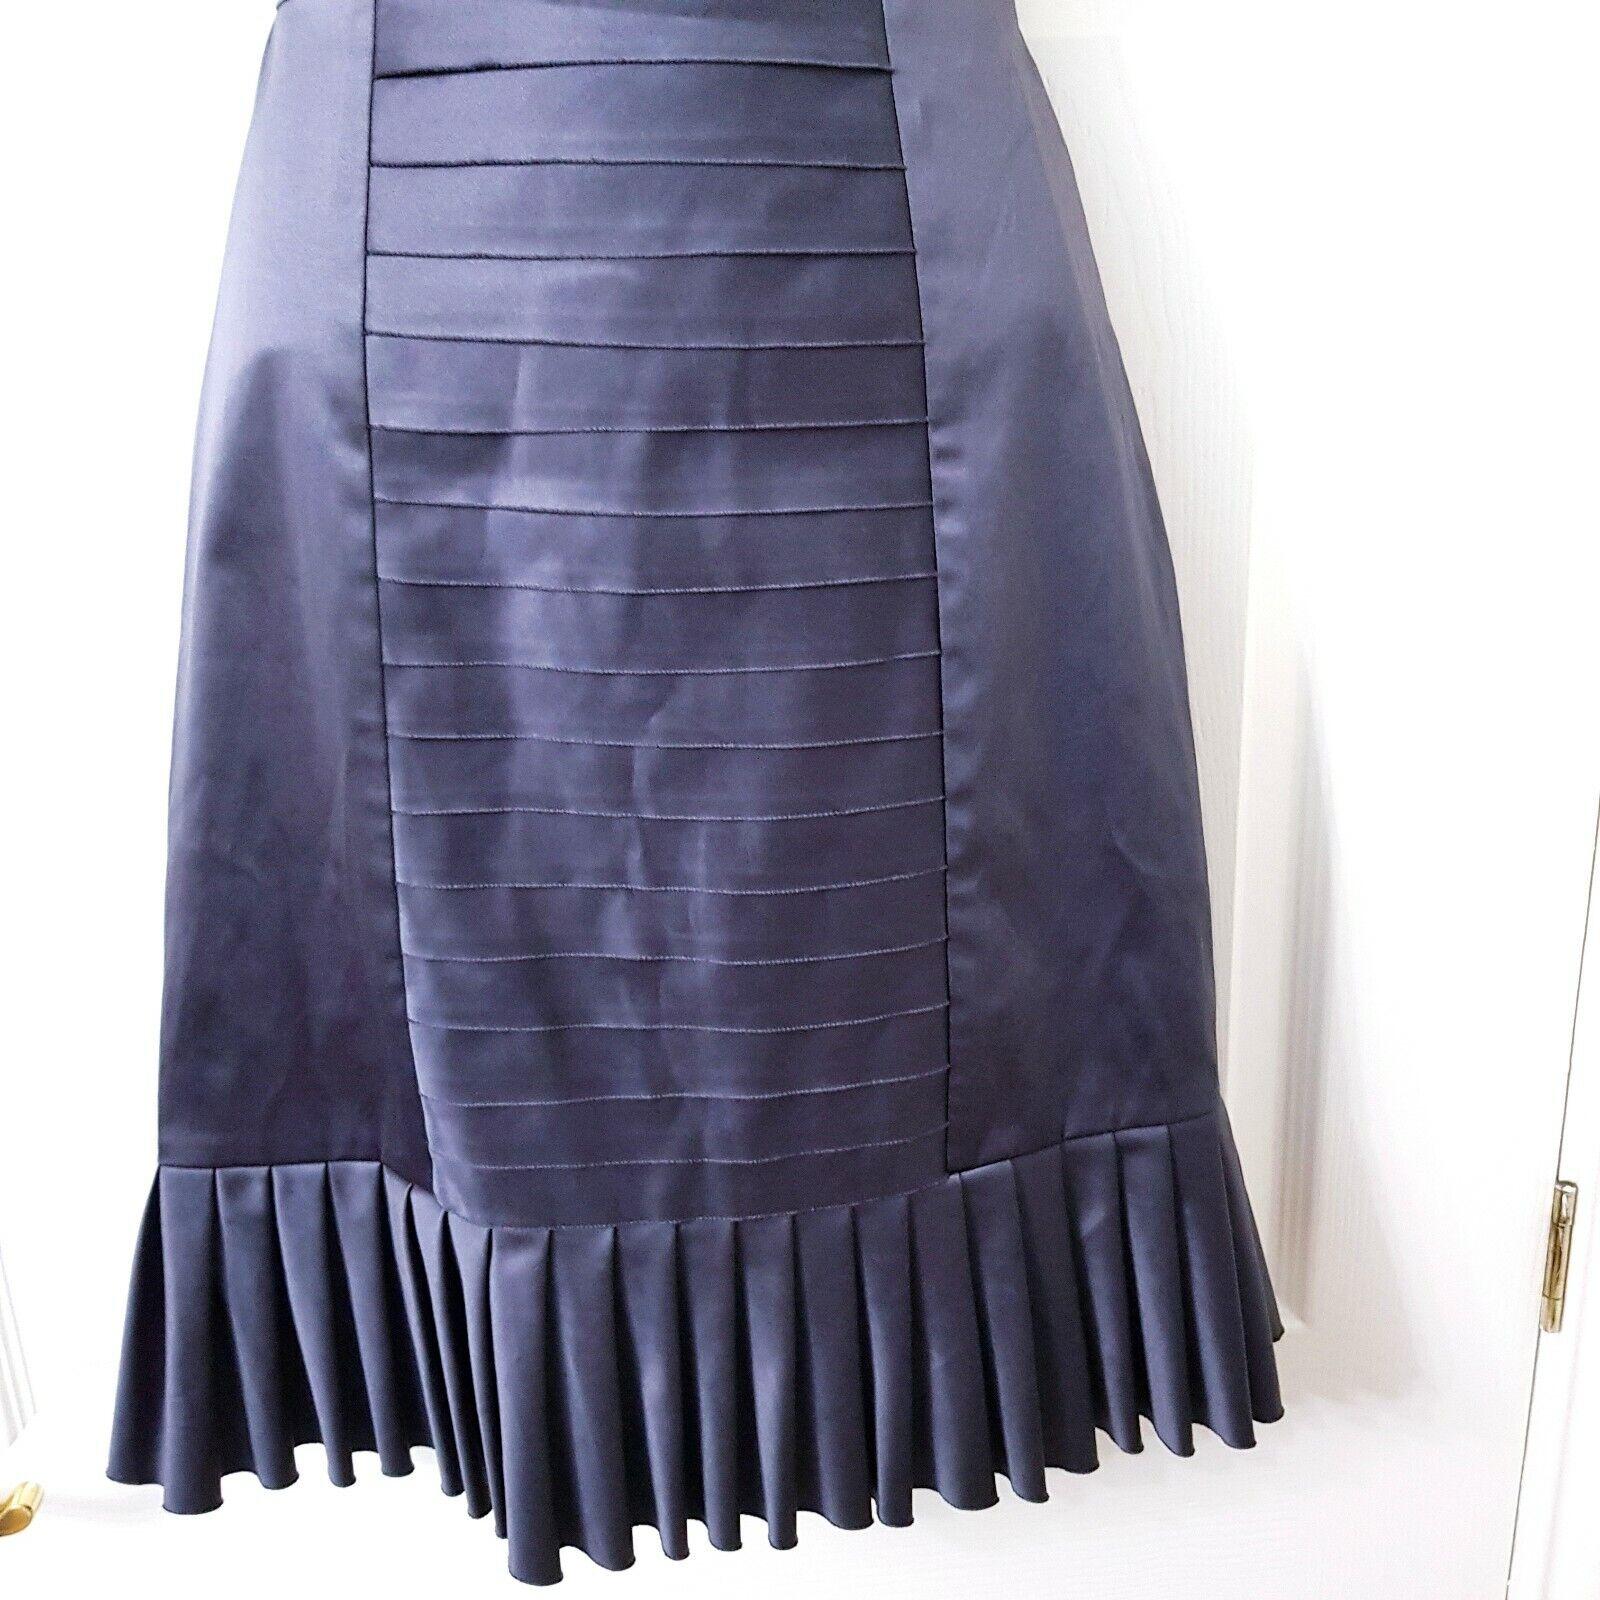 New BCBG Womens Grey Pleated Skirt Twofer Midi Dress Pencil Pencil Pencil Satin S BNWT ba30d0